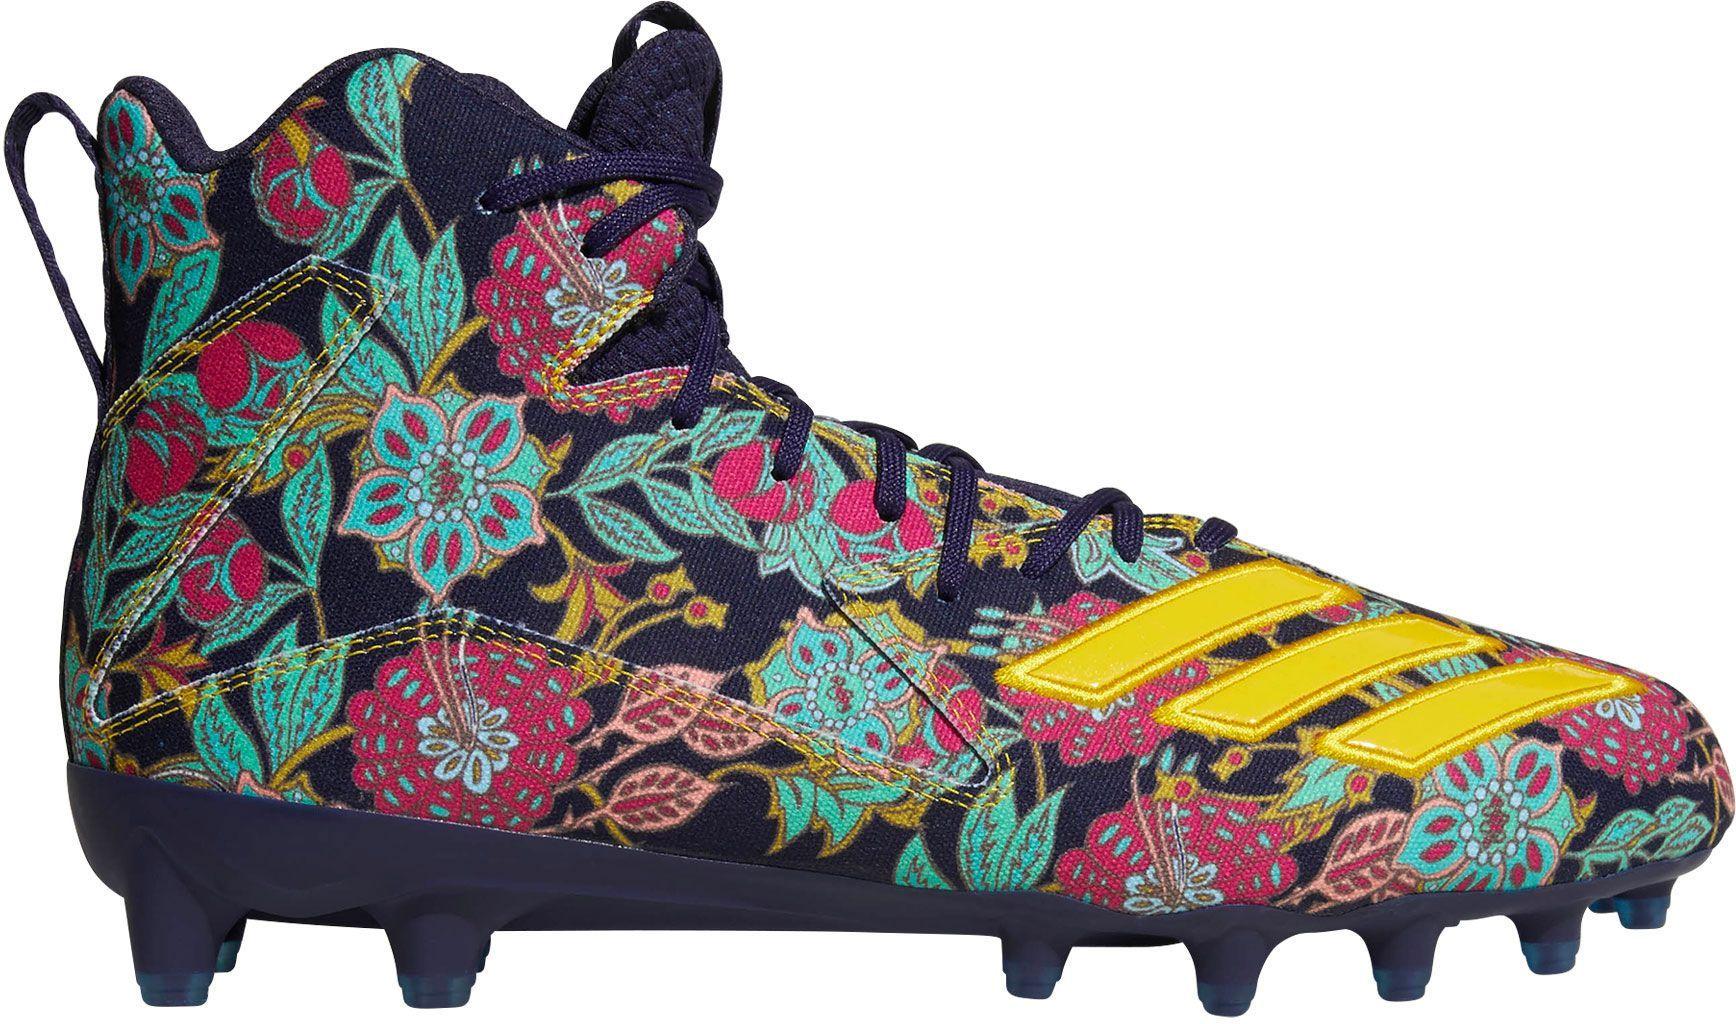 Adidas Men S Freak X Carbon Sundays Best Mid Football Cleats Size 12 0 Multi Adidas Men Football Cleats Men